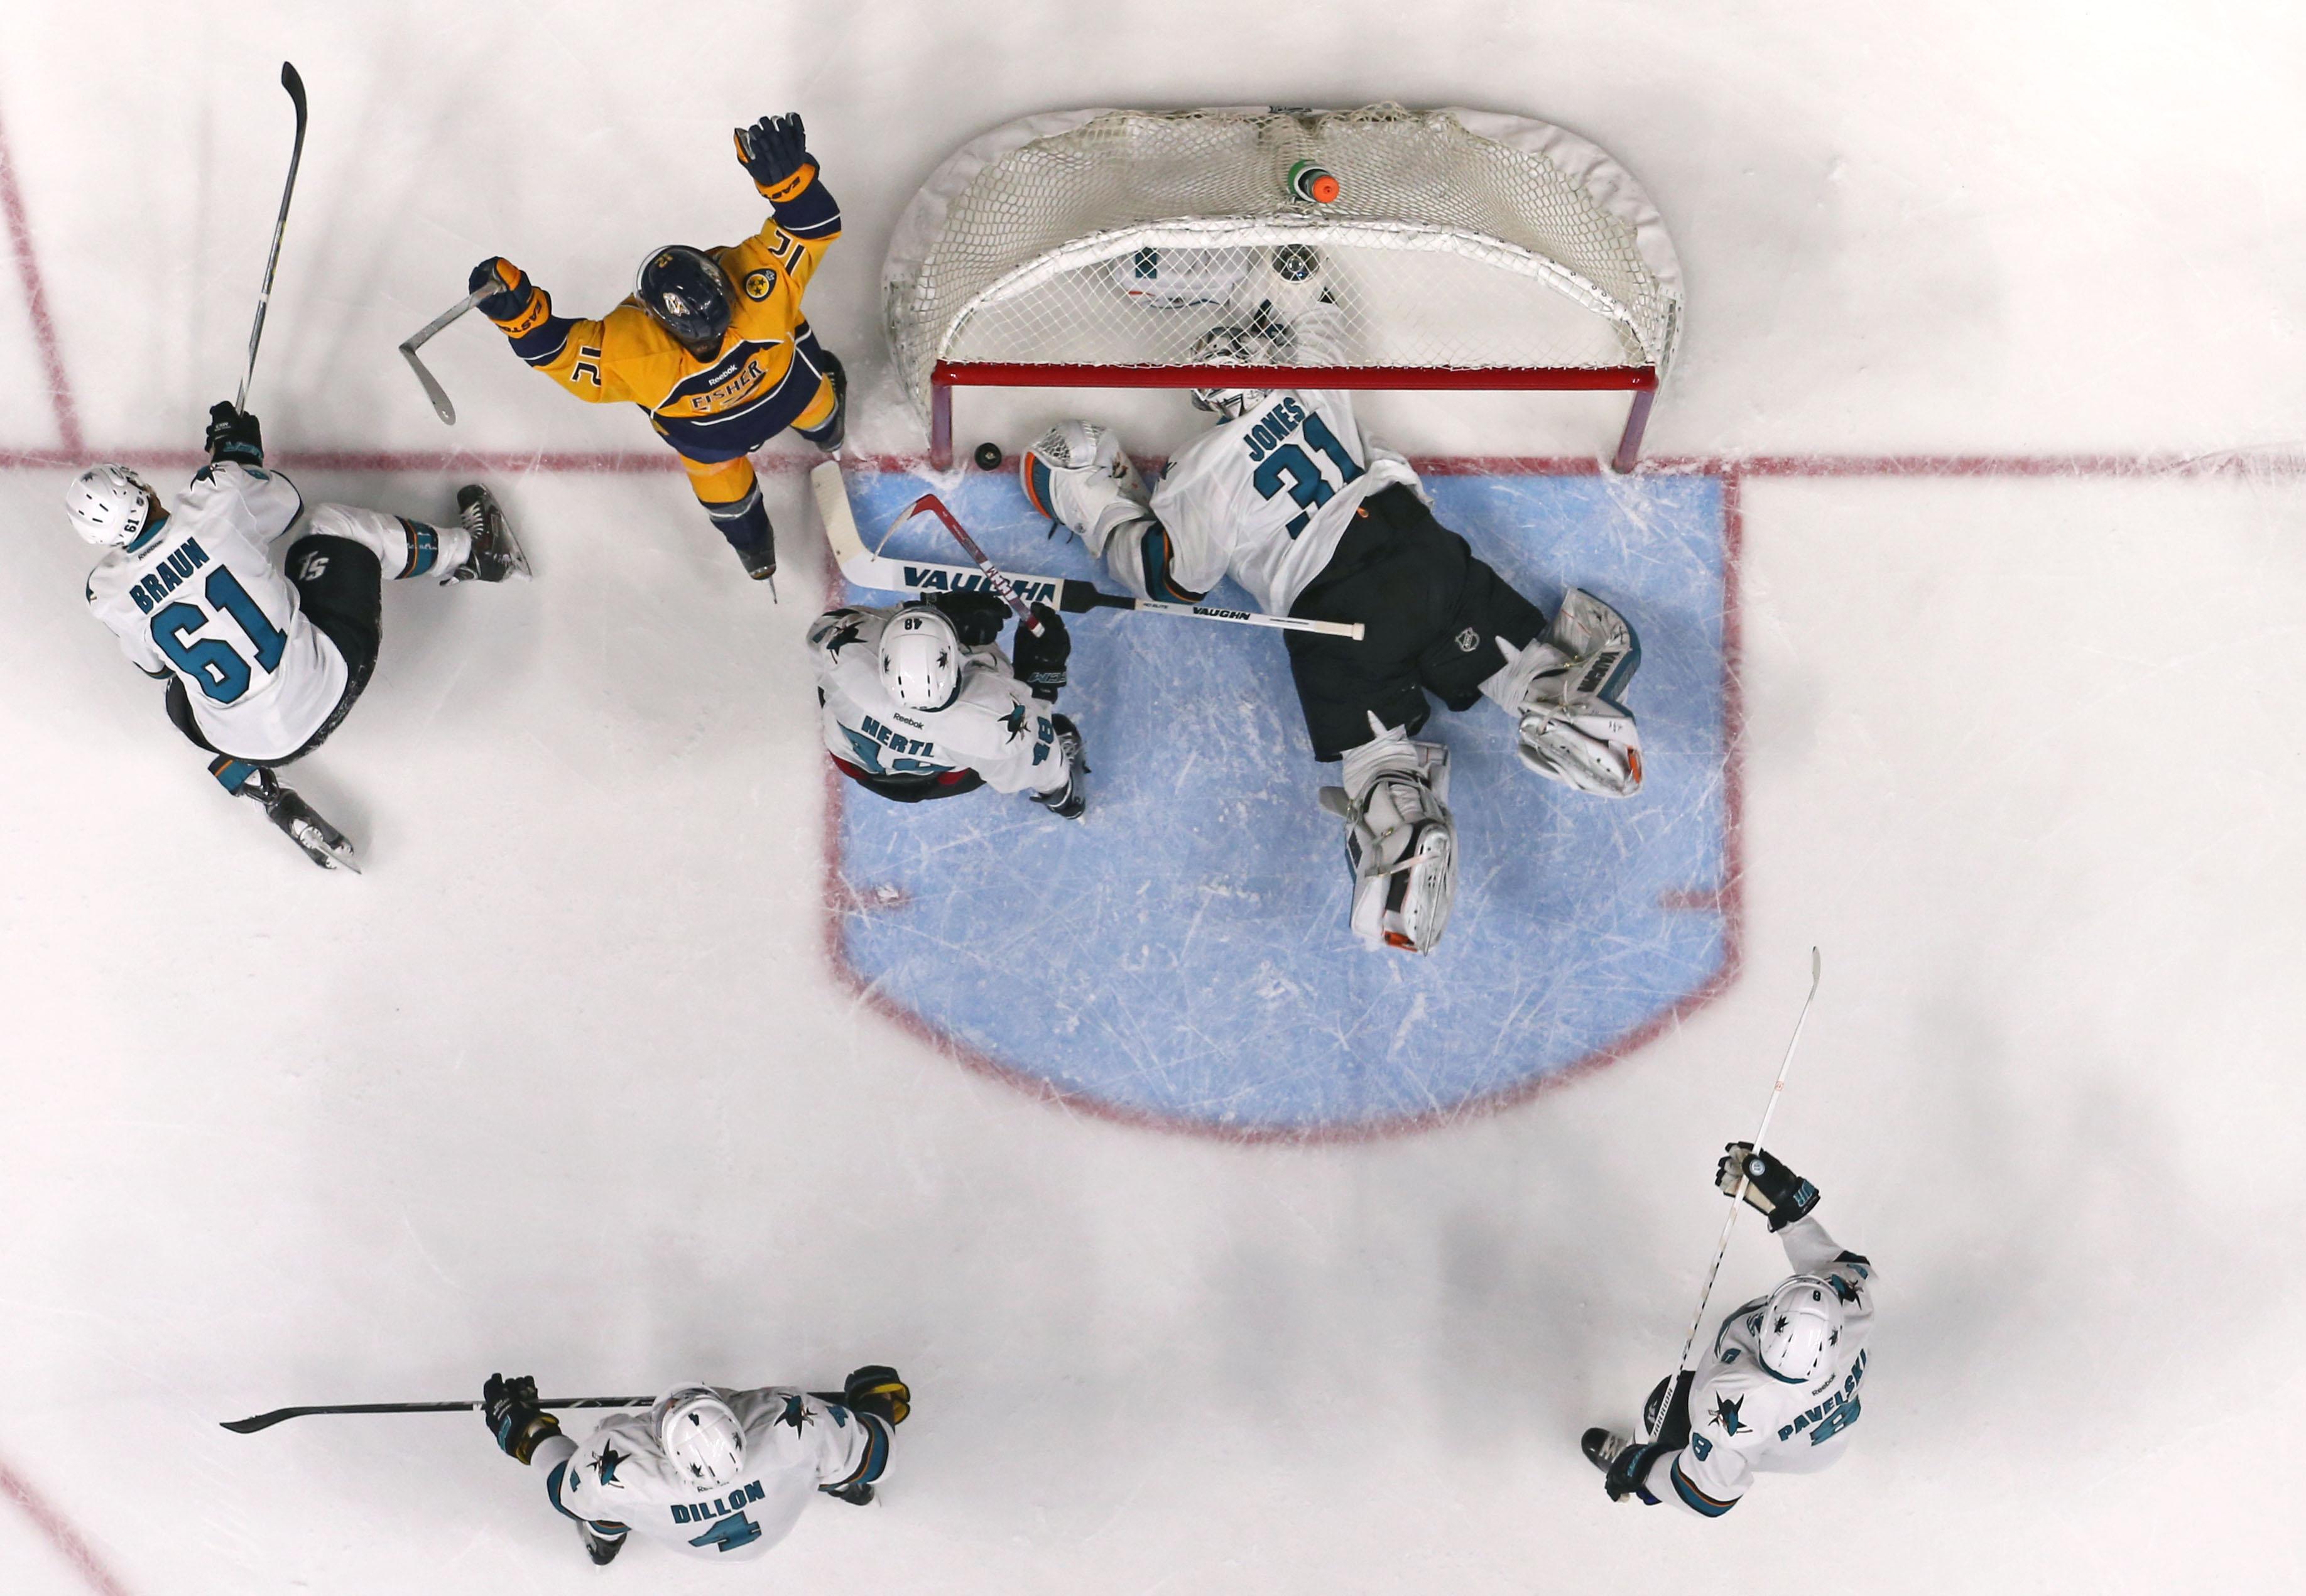 The Bruins have to hope Nashville beat former Bruin Martin Jones and the San Jose Sharks to get the highest pick back